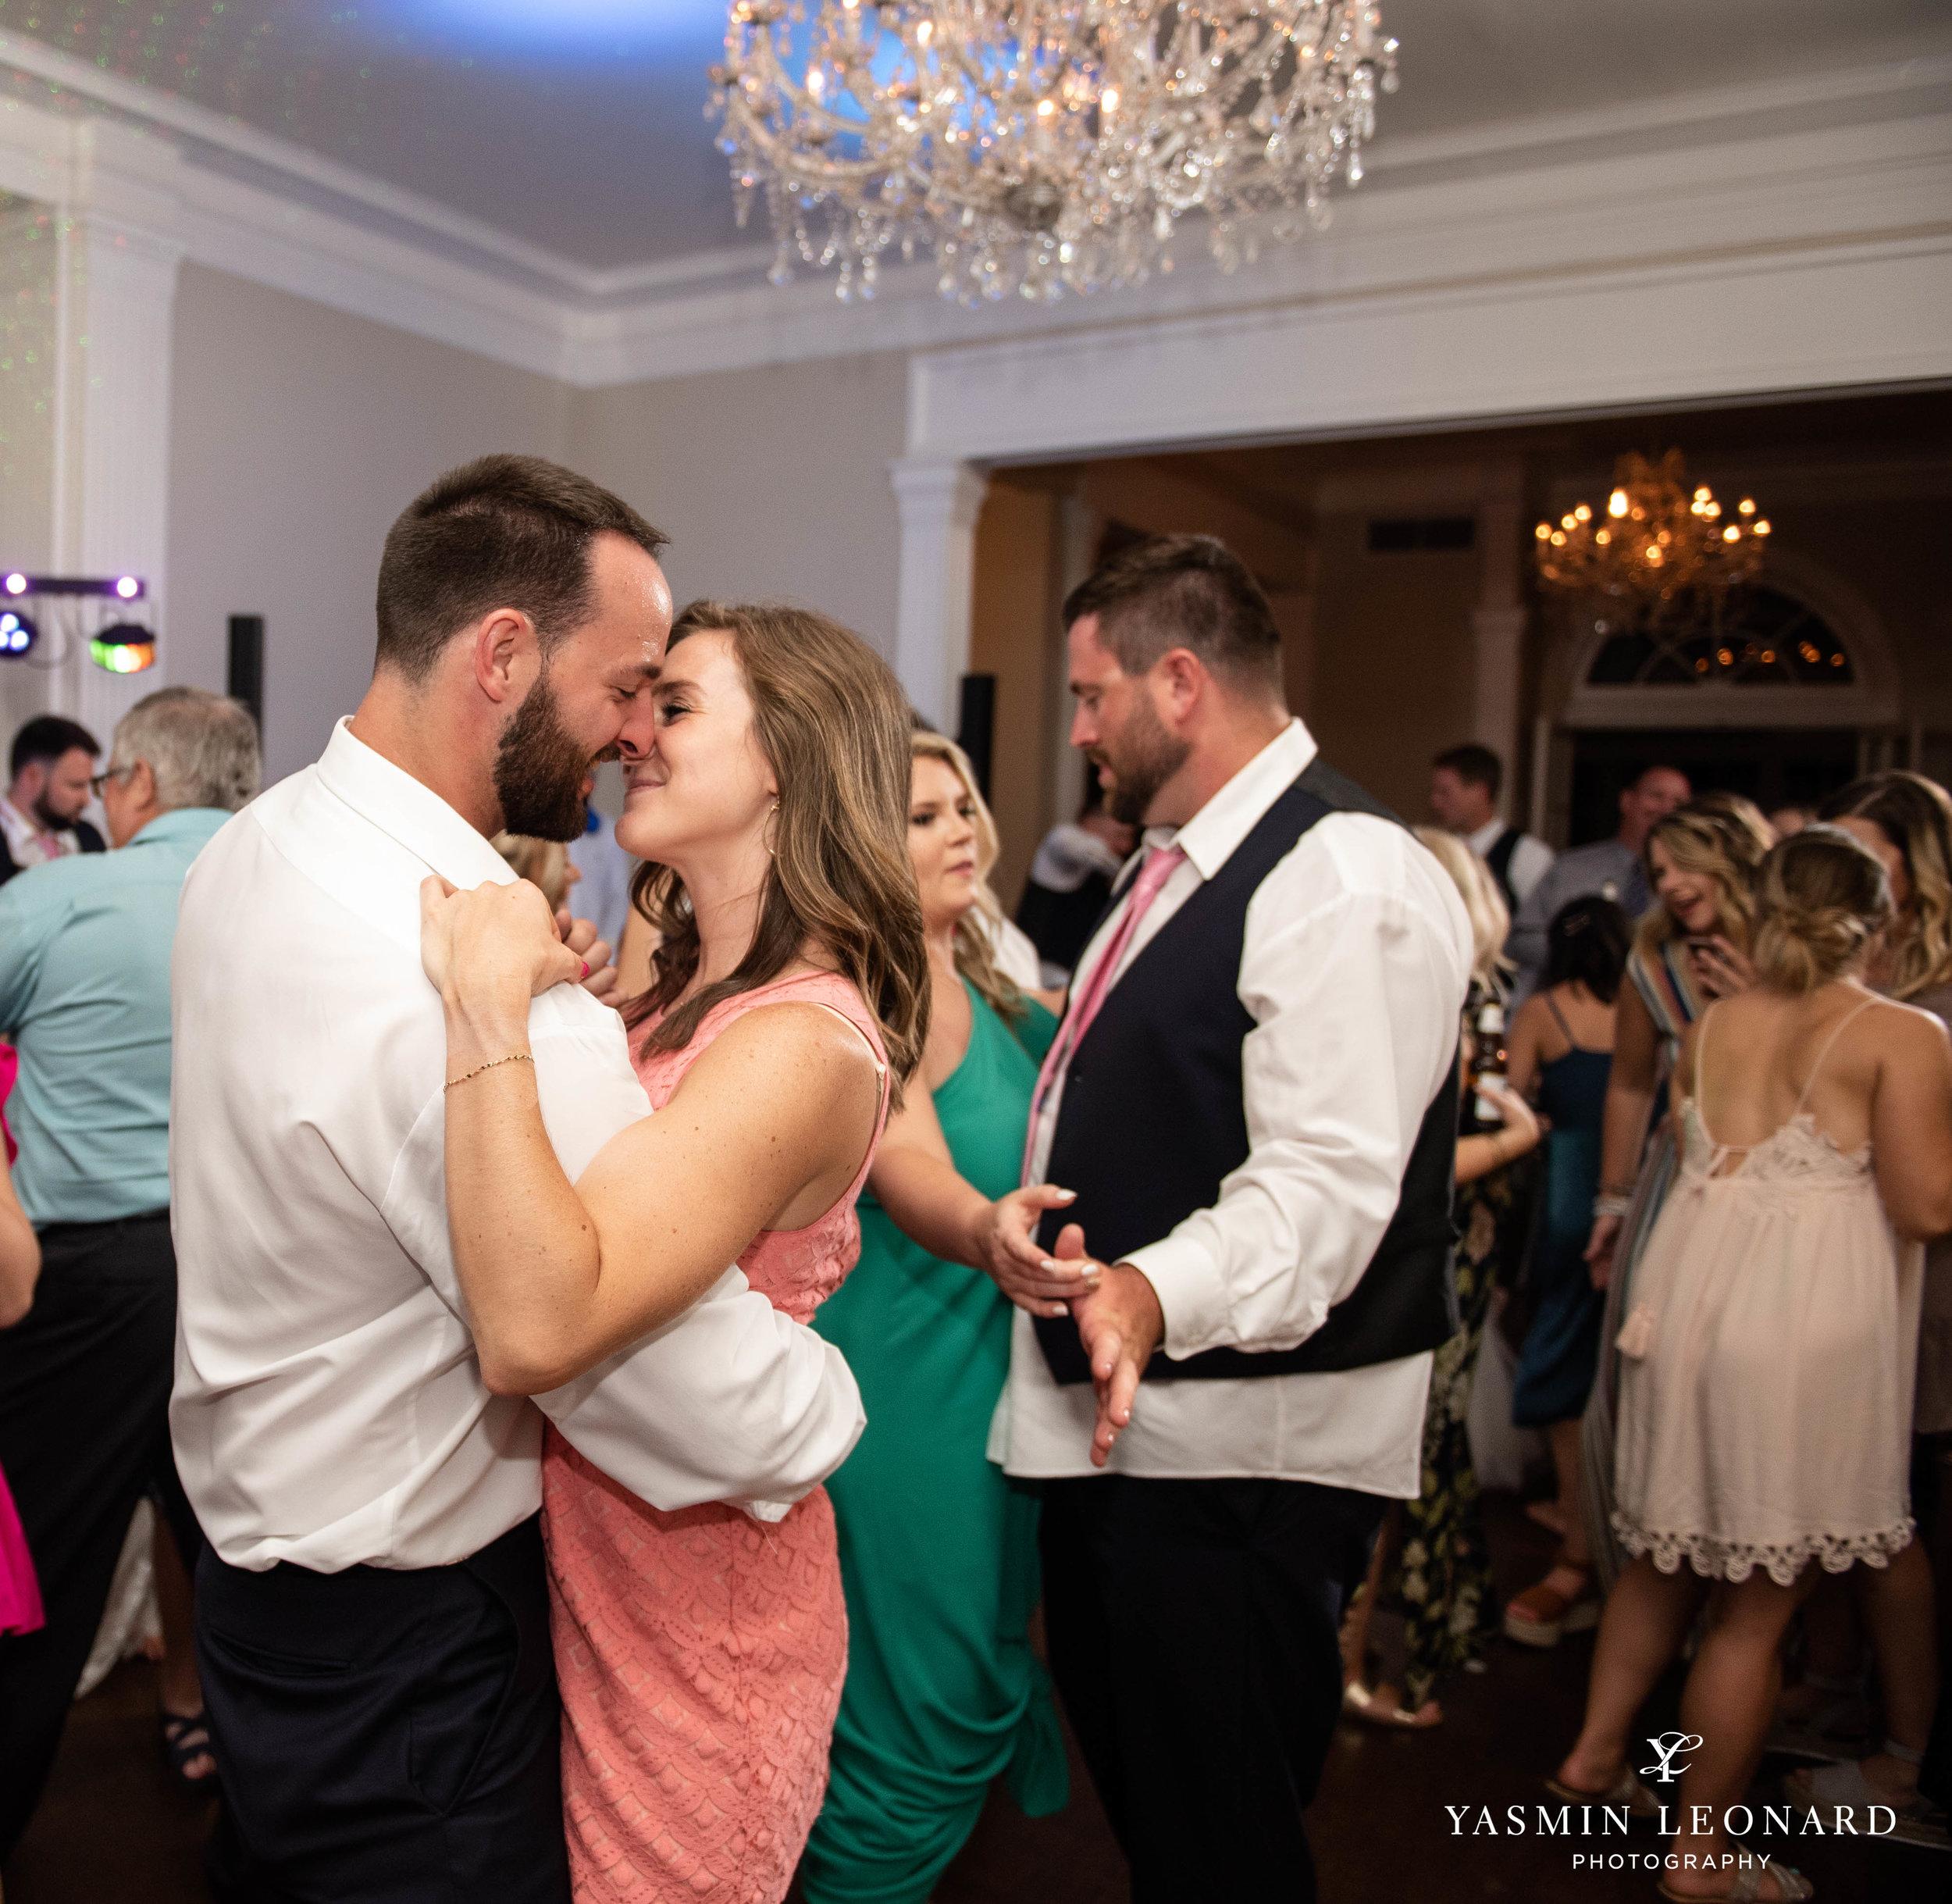 Separk Mansion - NC Weddings - Gastonia Wedding - NC Wedding Venues - Pink and Blue Wedding Ideas - Pink Bridesmaid Dresses - Yasmin Leonard Photography-65.jpg